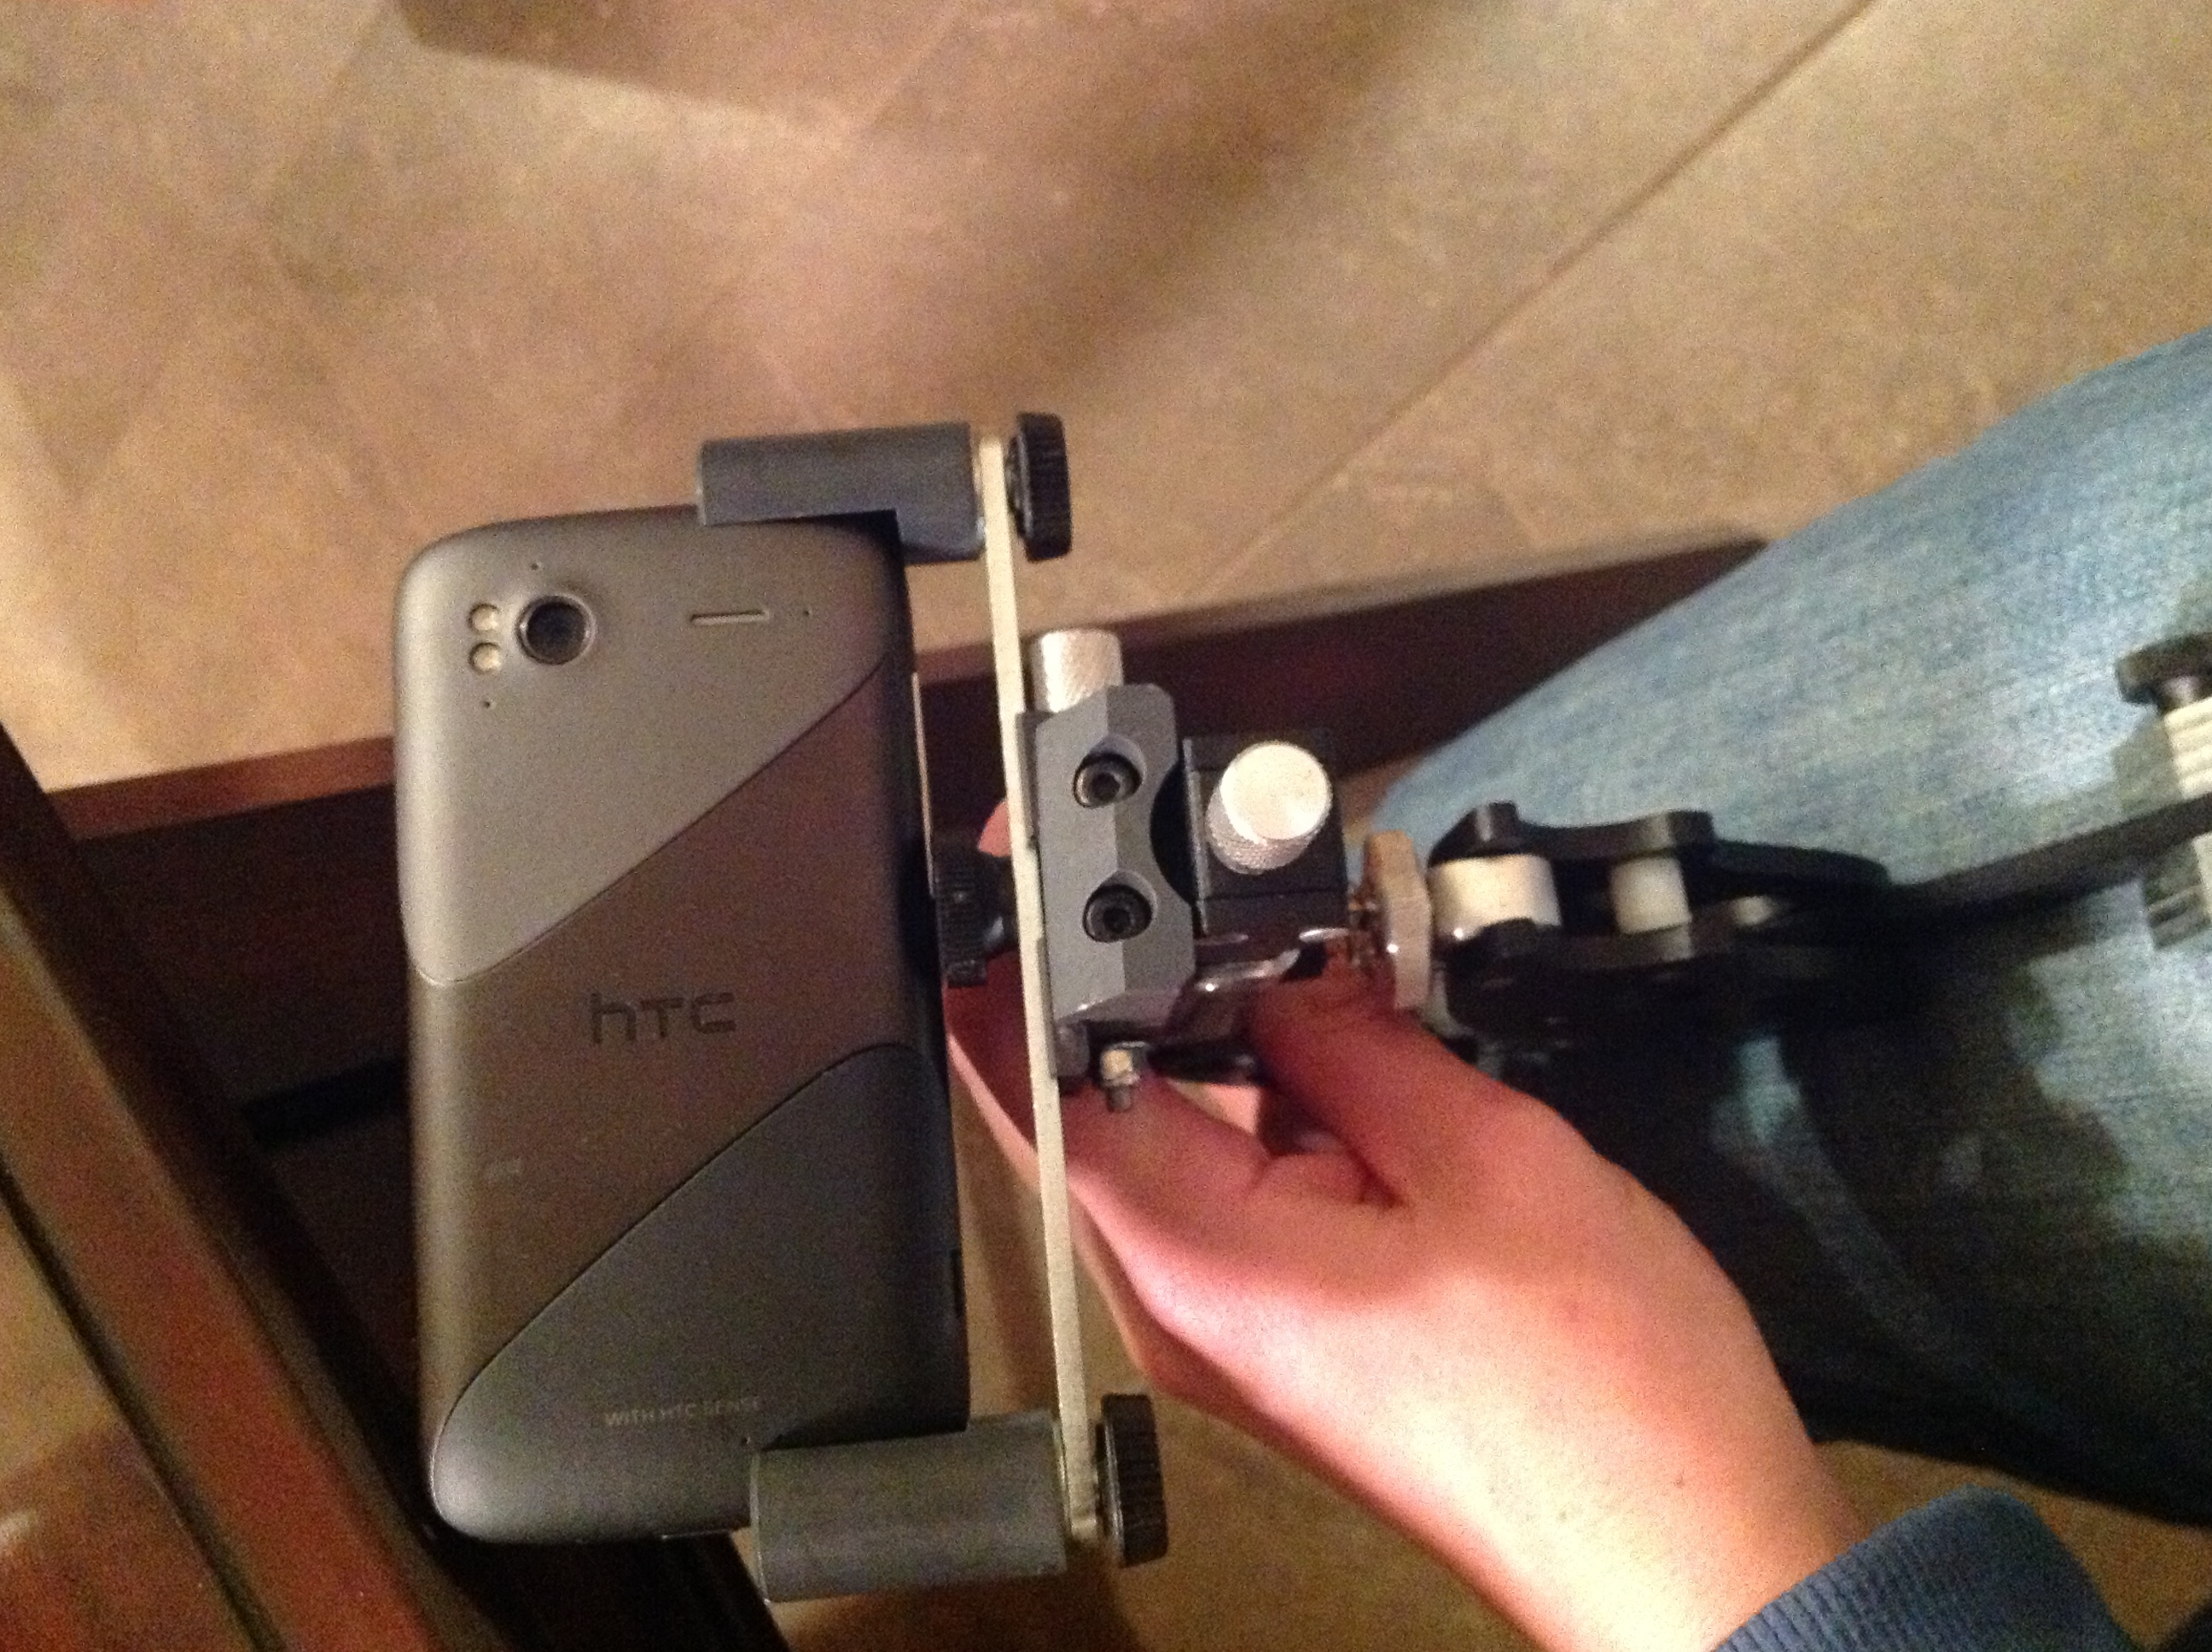 Photography Gear Misc Gear iPhone Gear